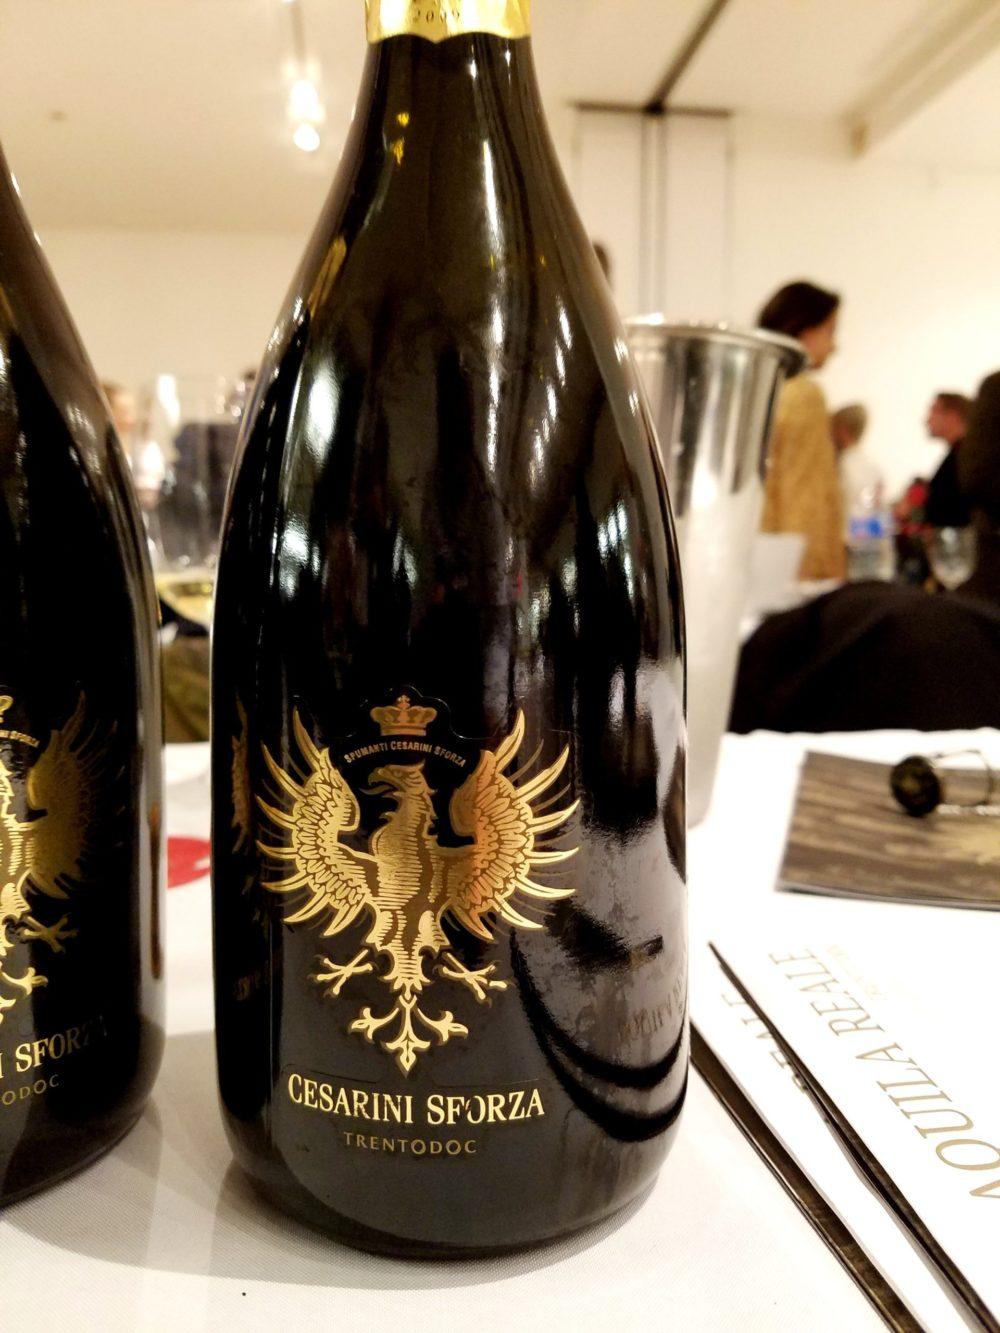 Cesarini Sforza 2009, Gambero Rosso New York Winetasting, Wine Casual